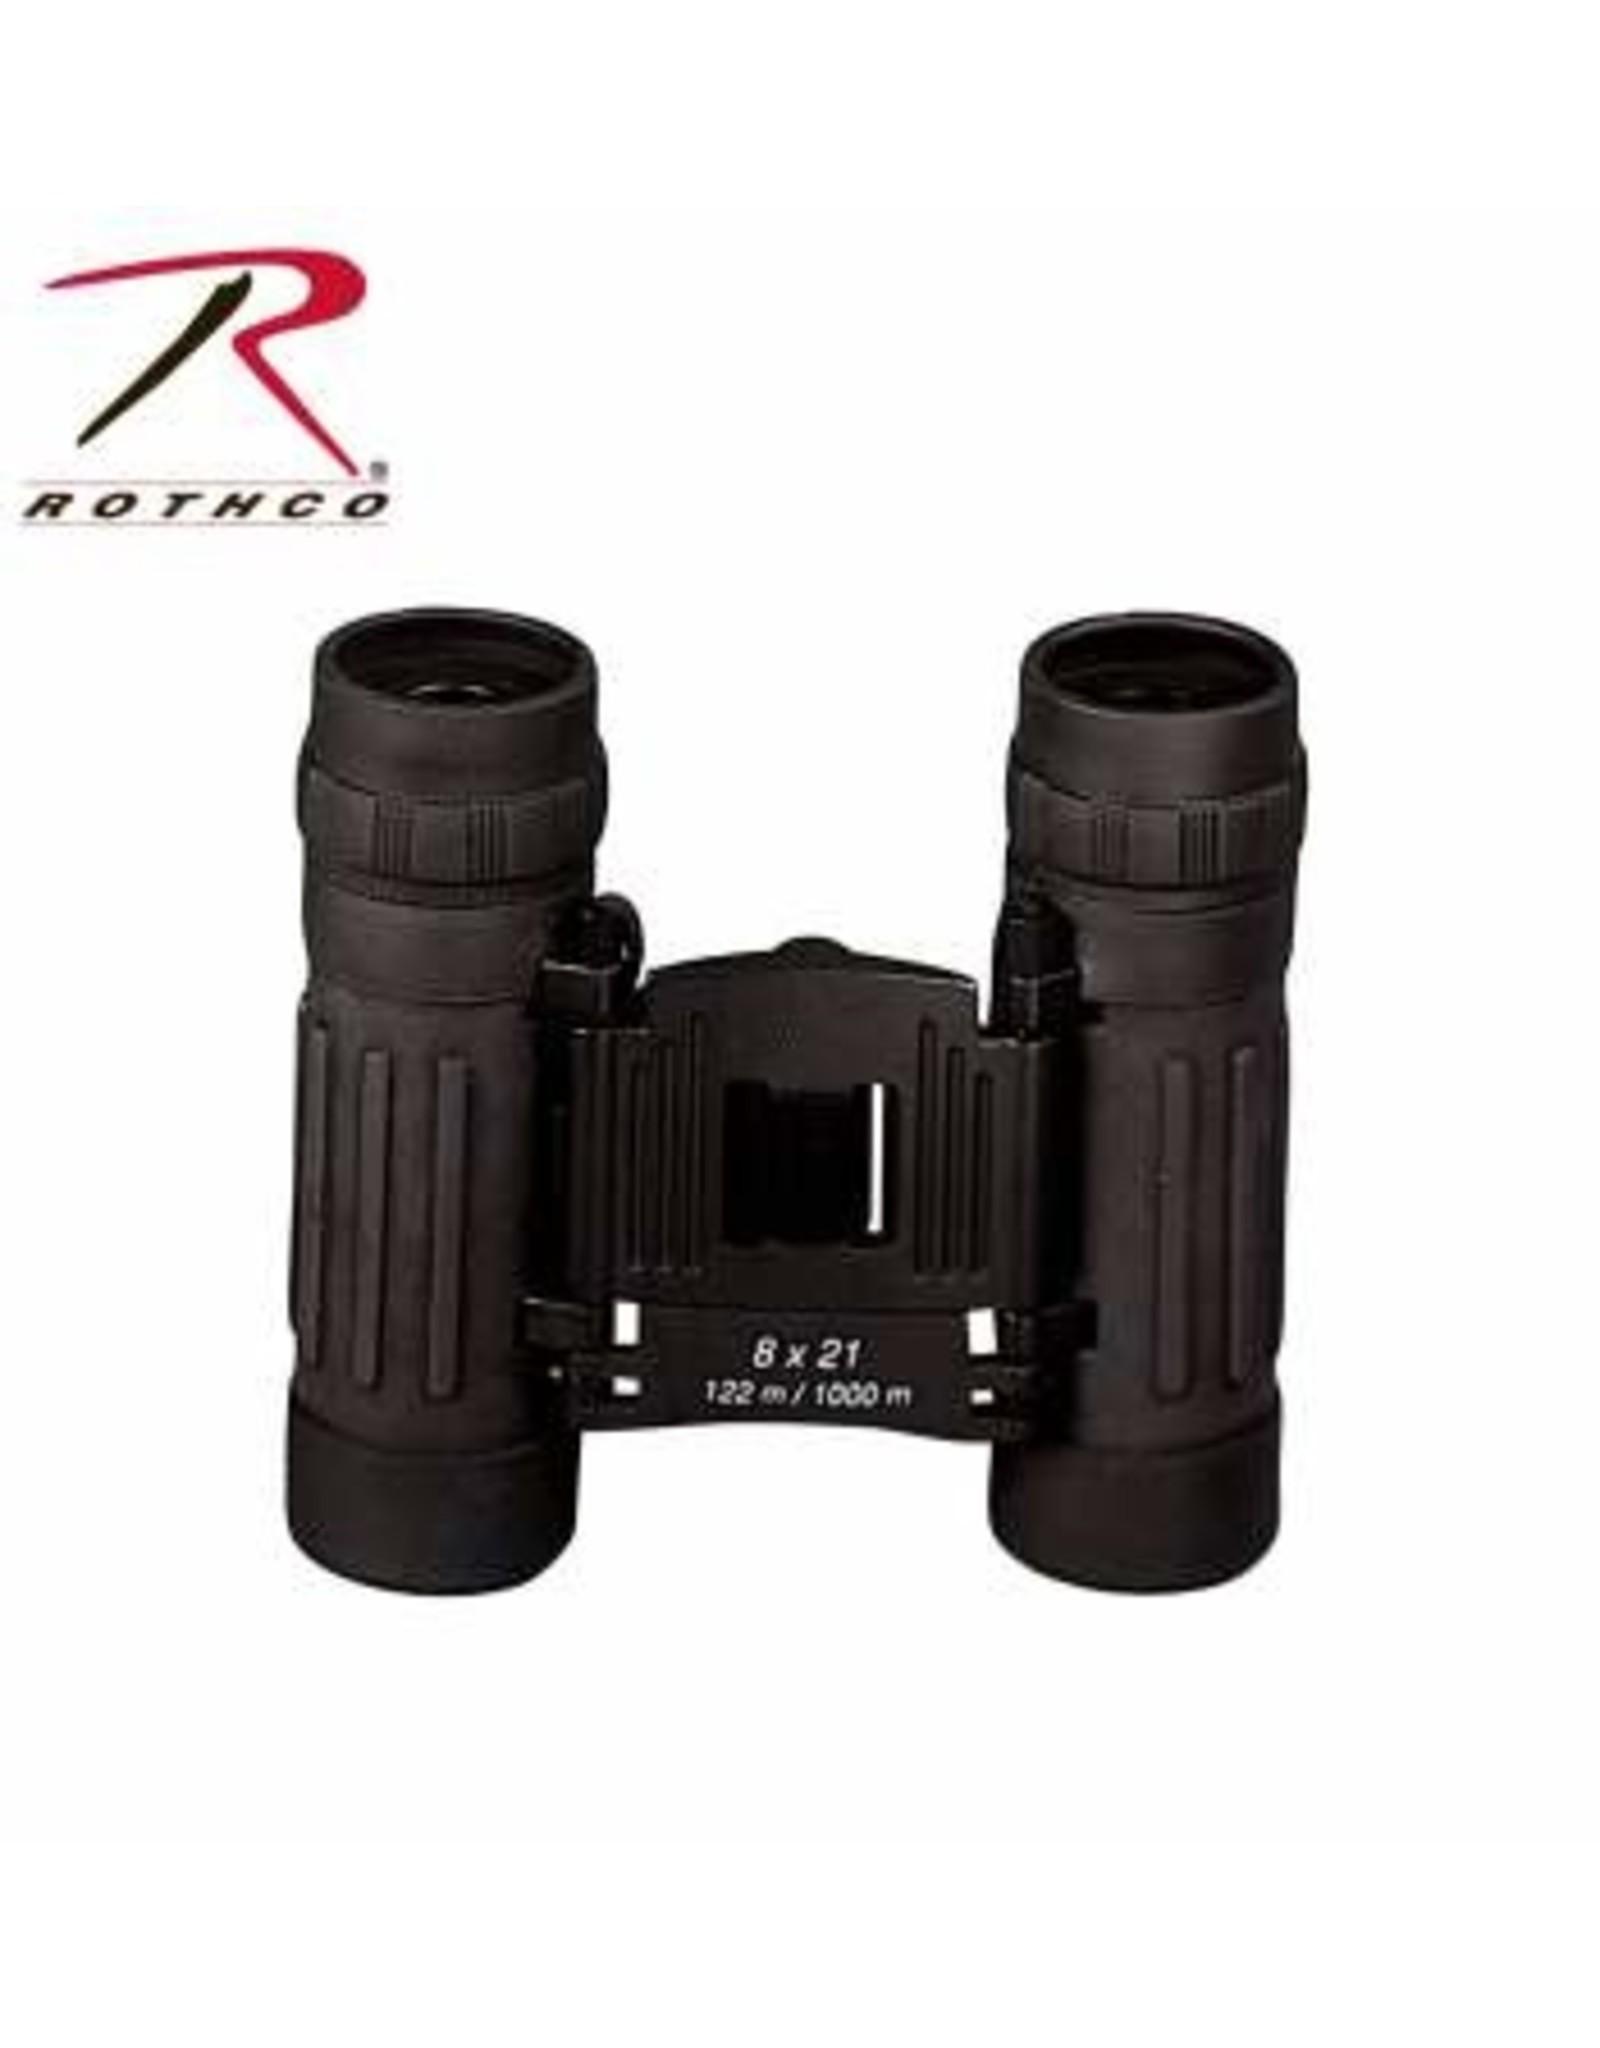 Compact 8 x 21mm Binoculars - Black